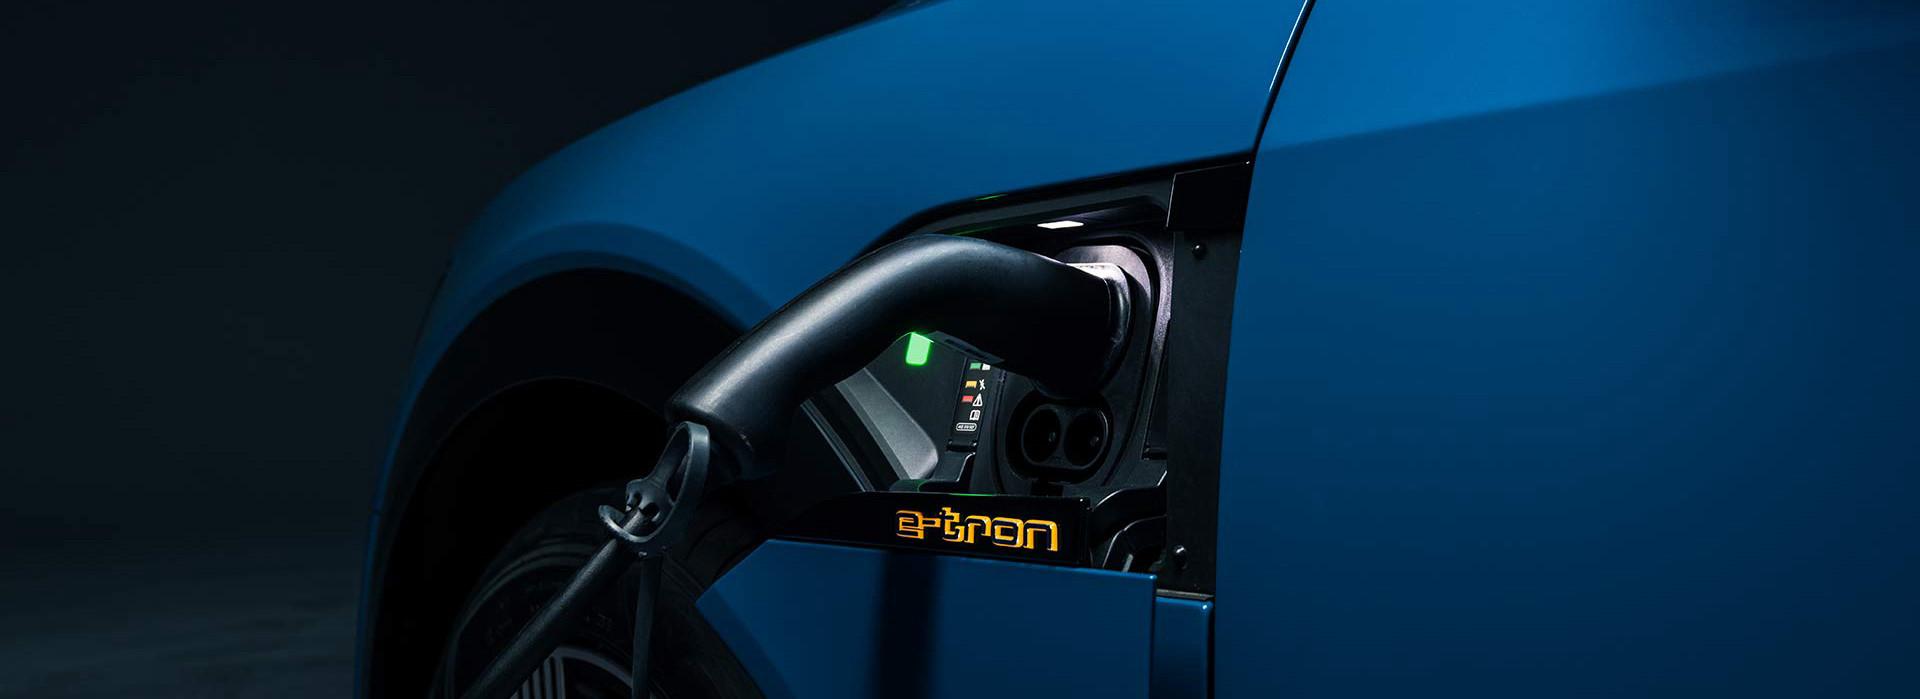 2019 Audi e-tron Charging